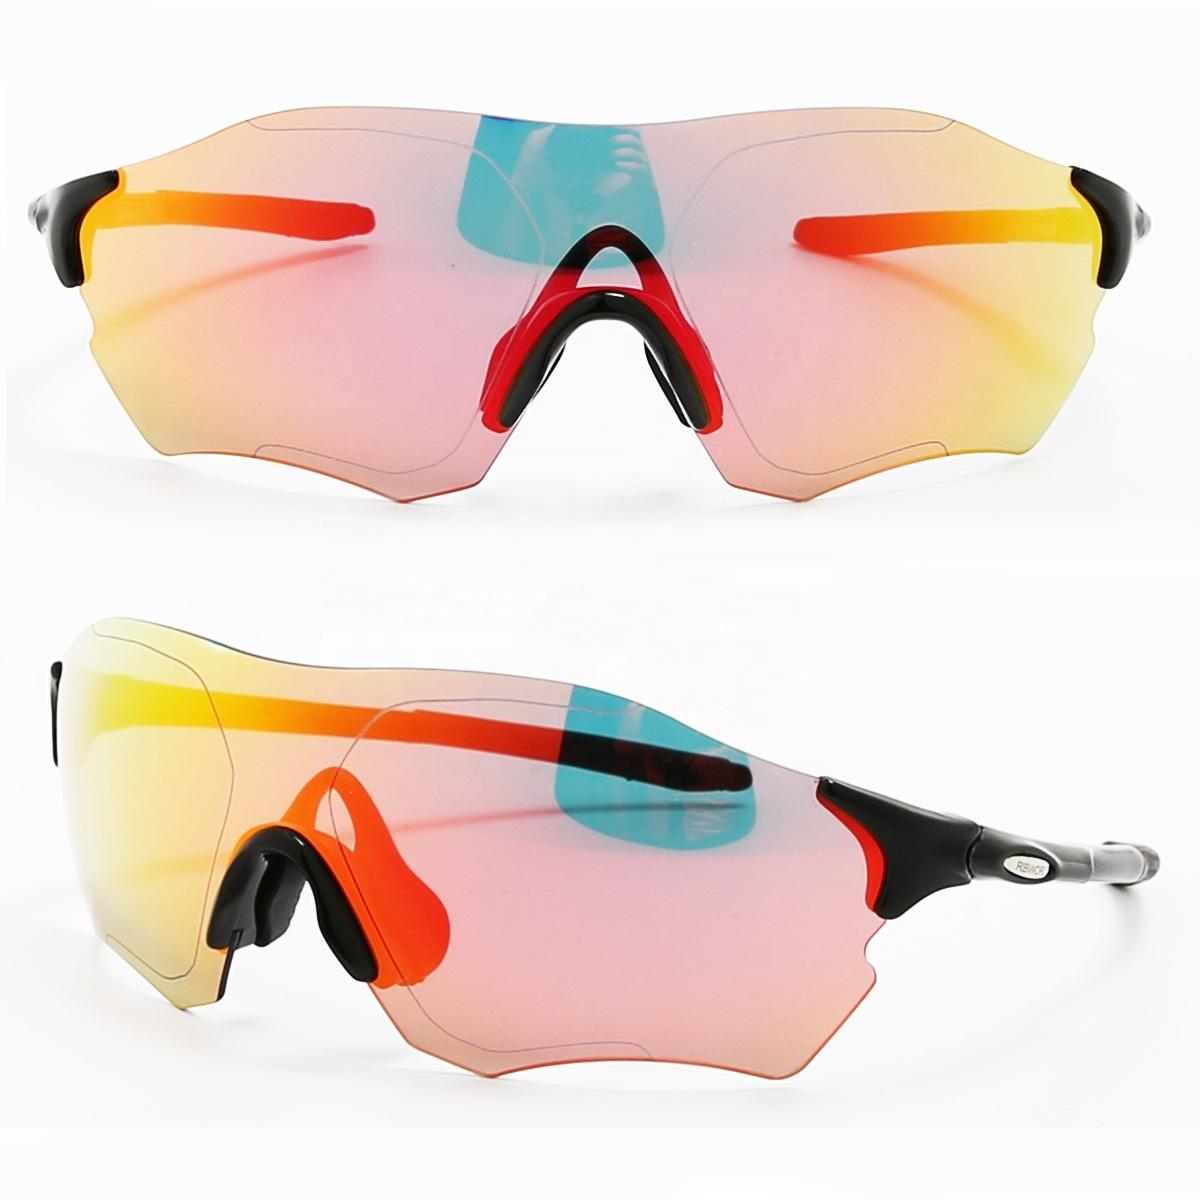 Cycling Sun Glasses Bike Bicycle Eyewear Men Women Outdoor Sport Goggles